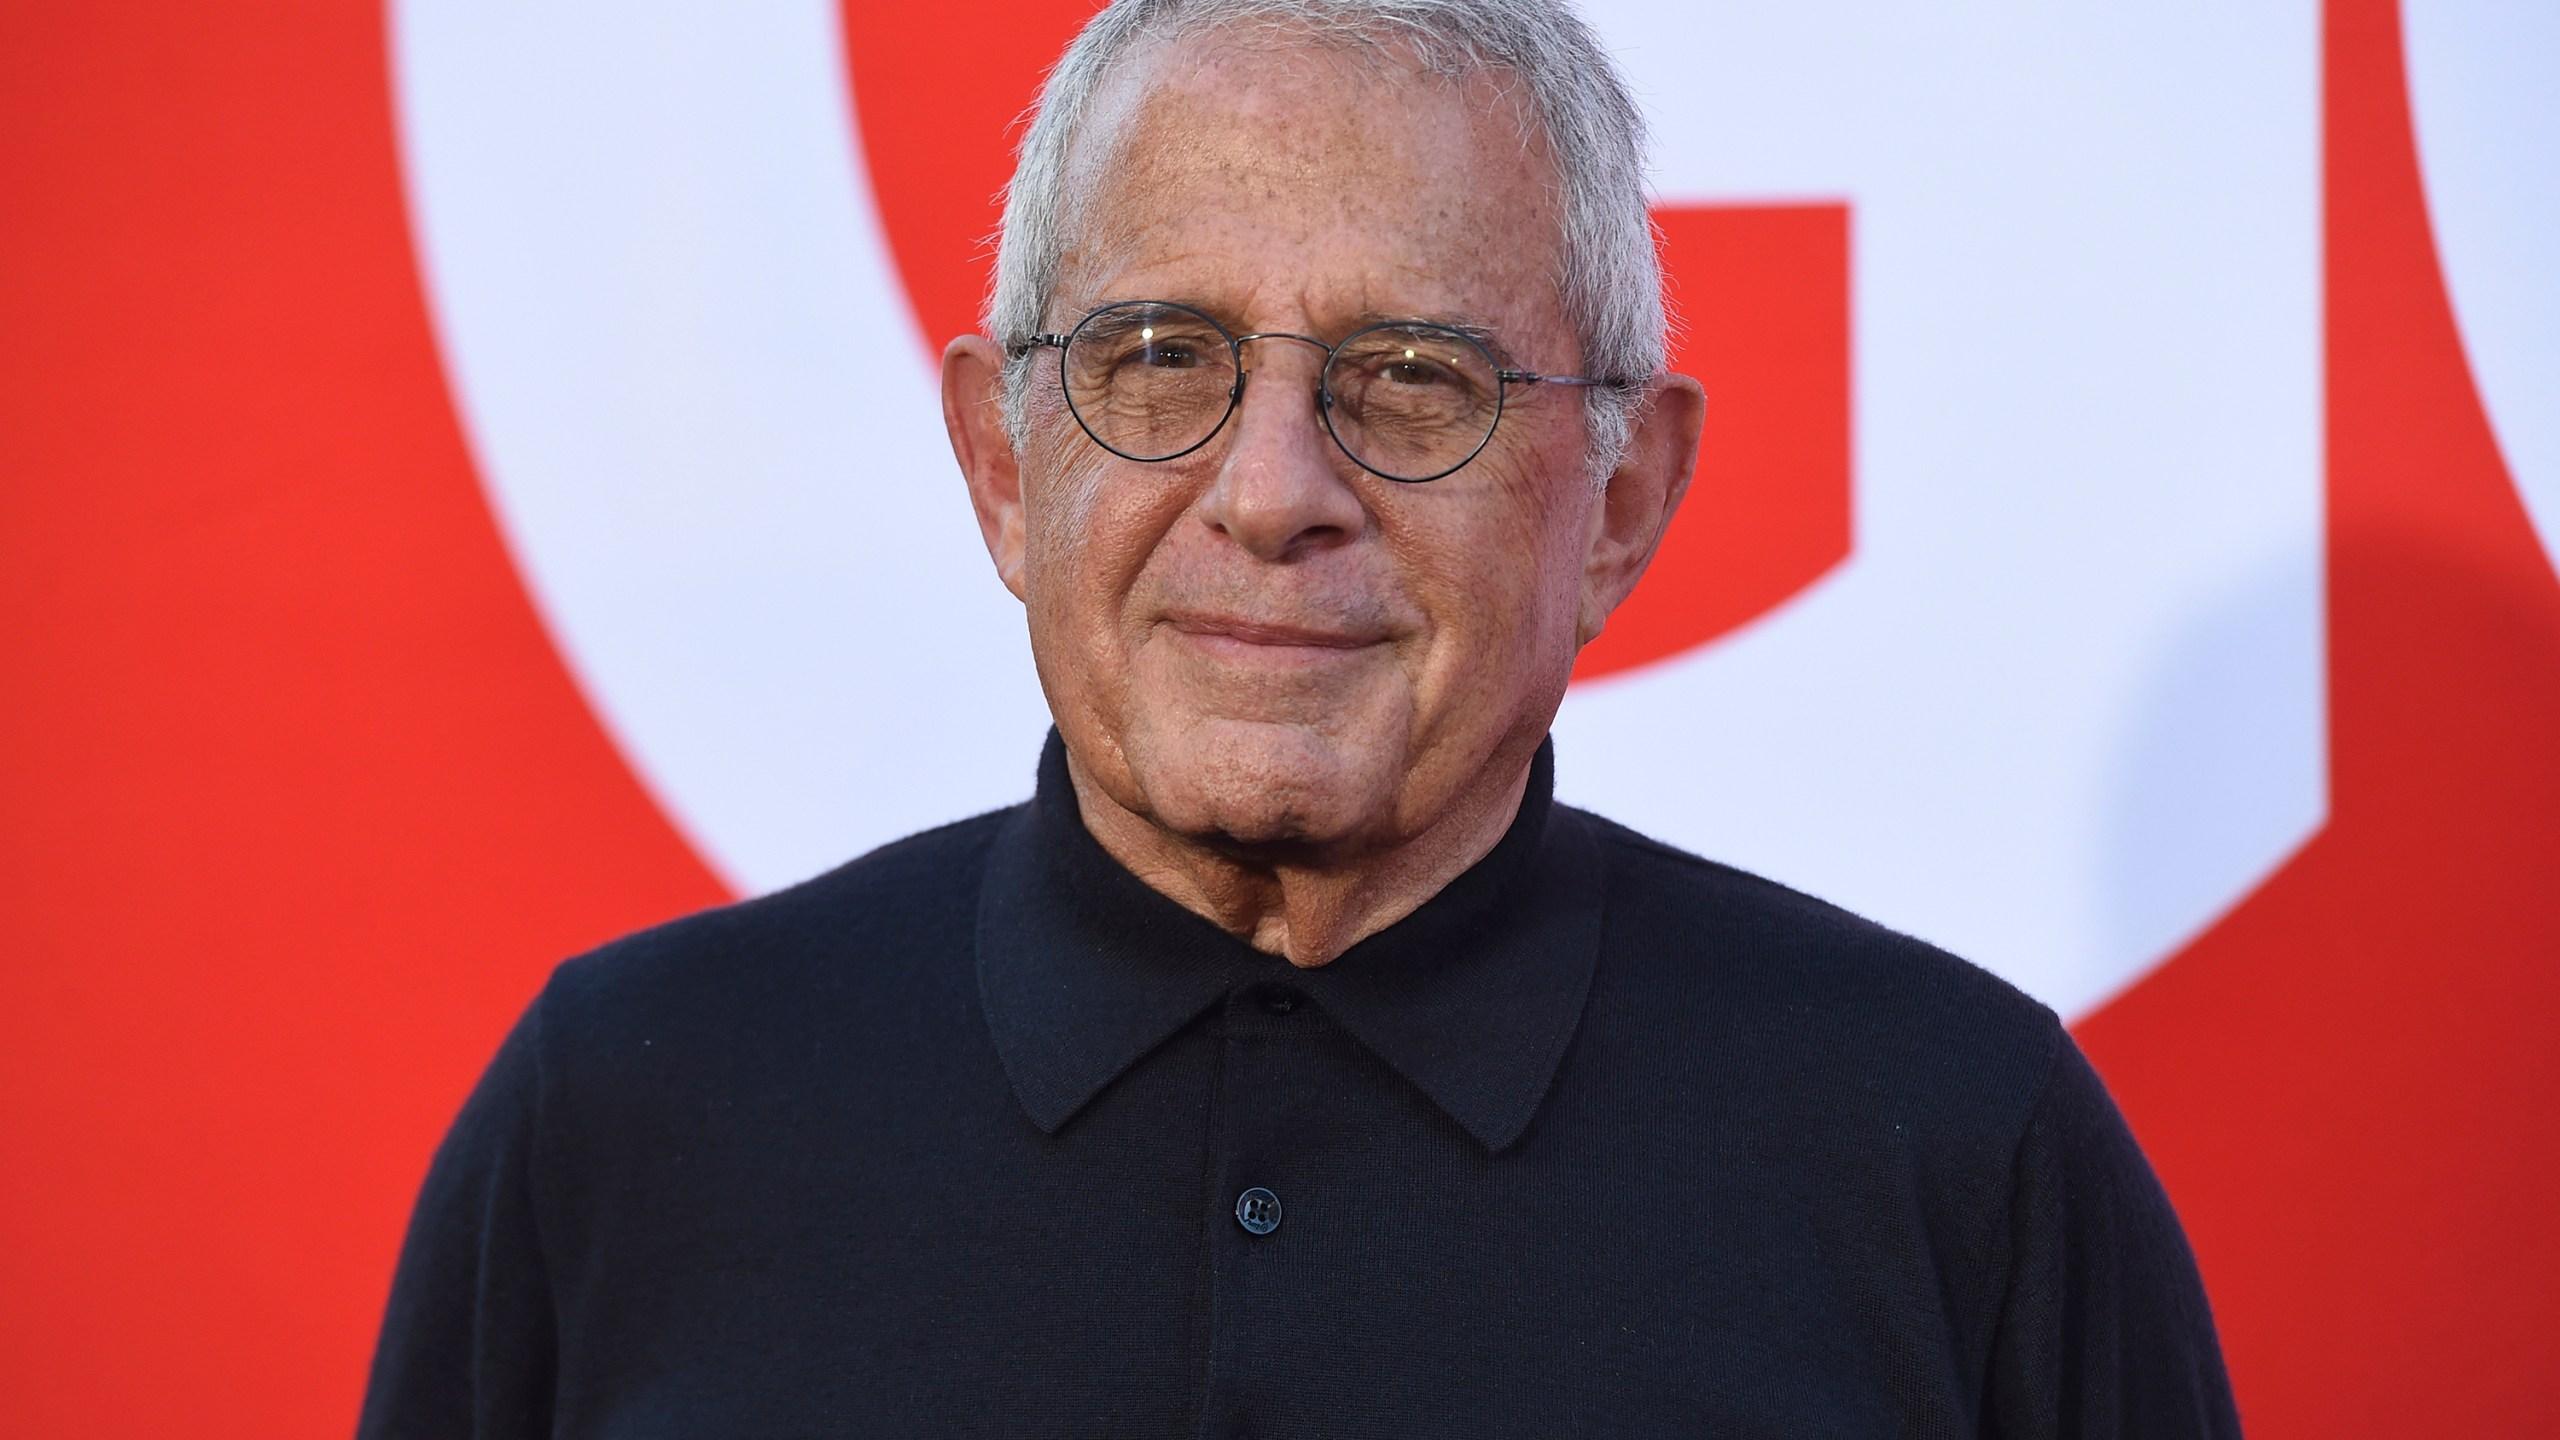 Ron Meyer